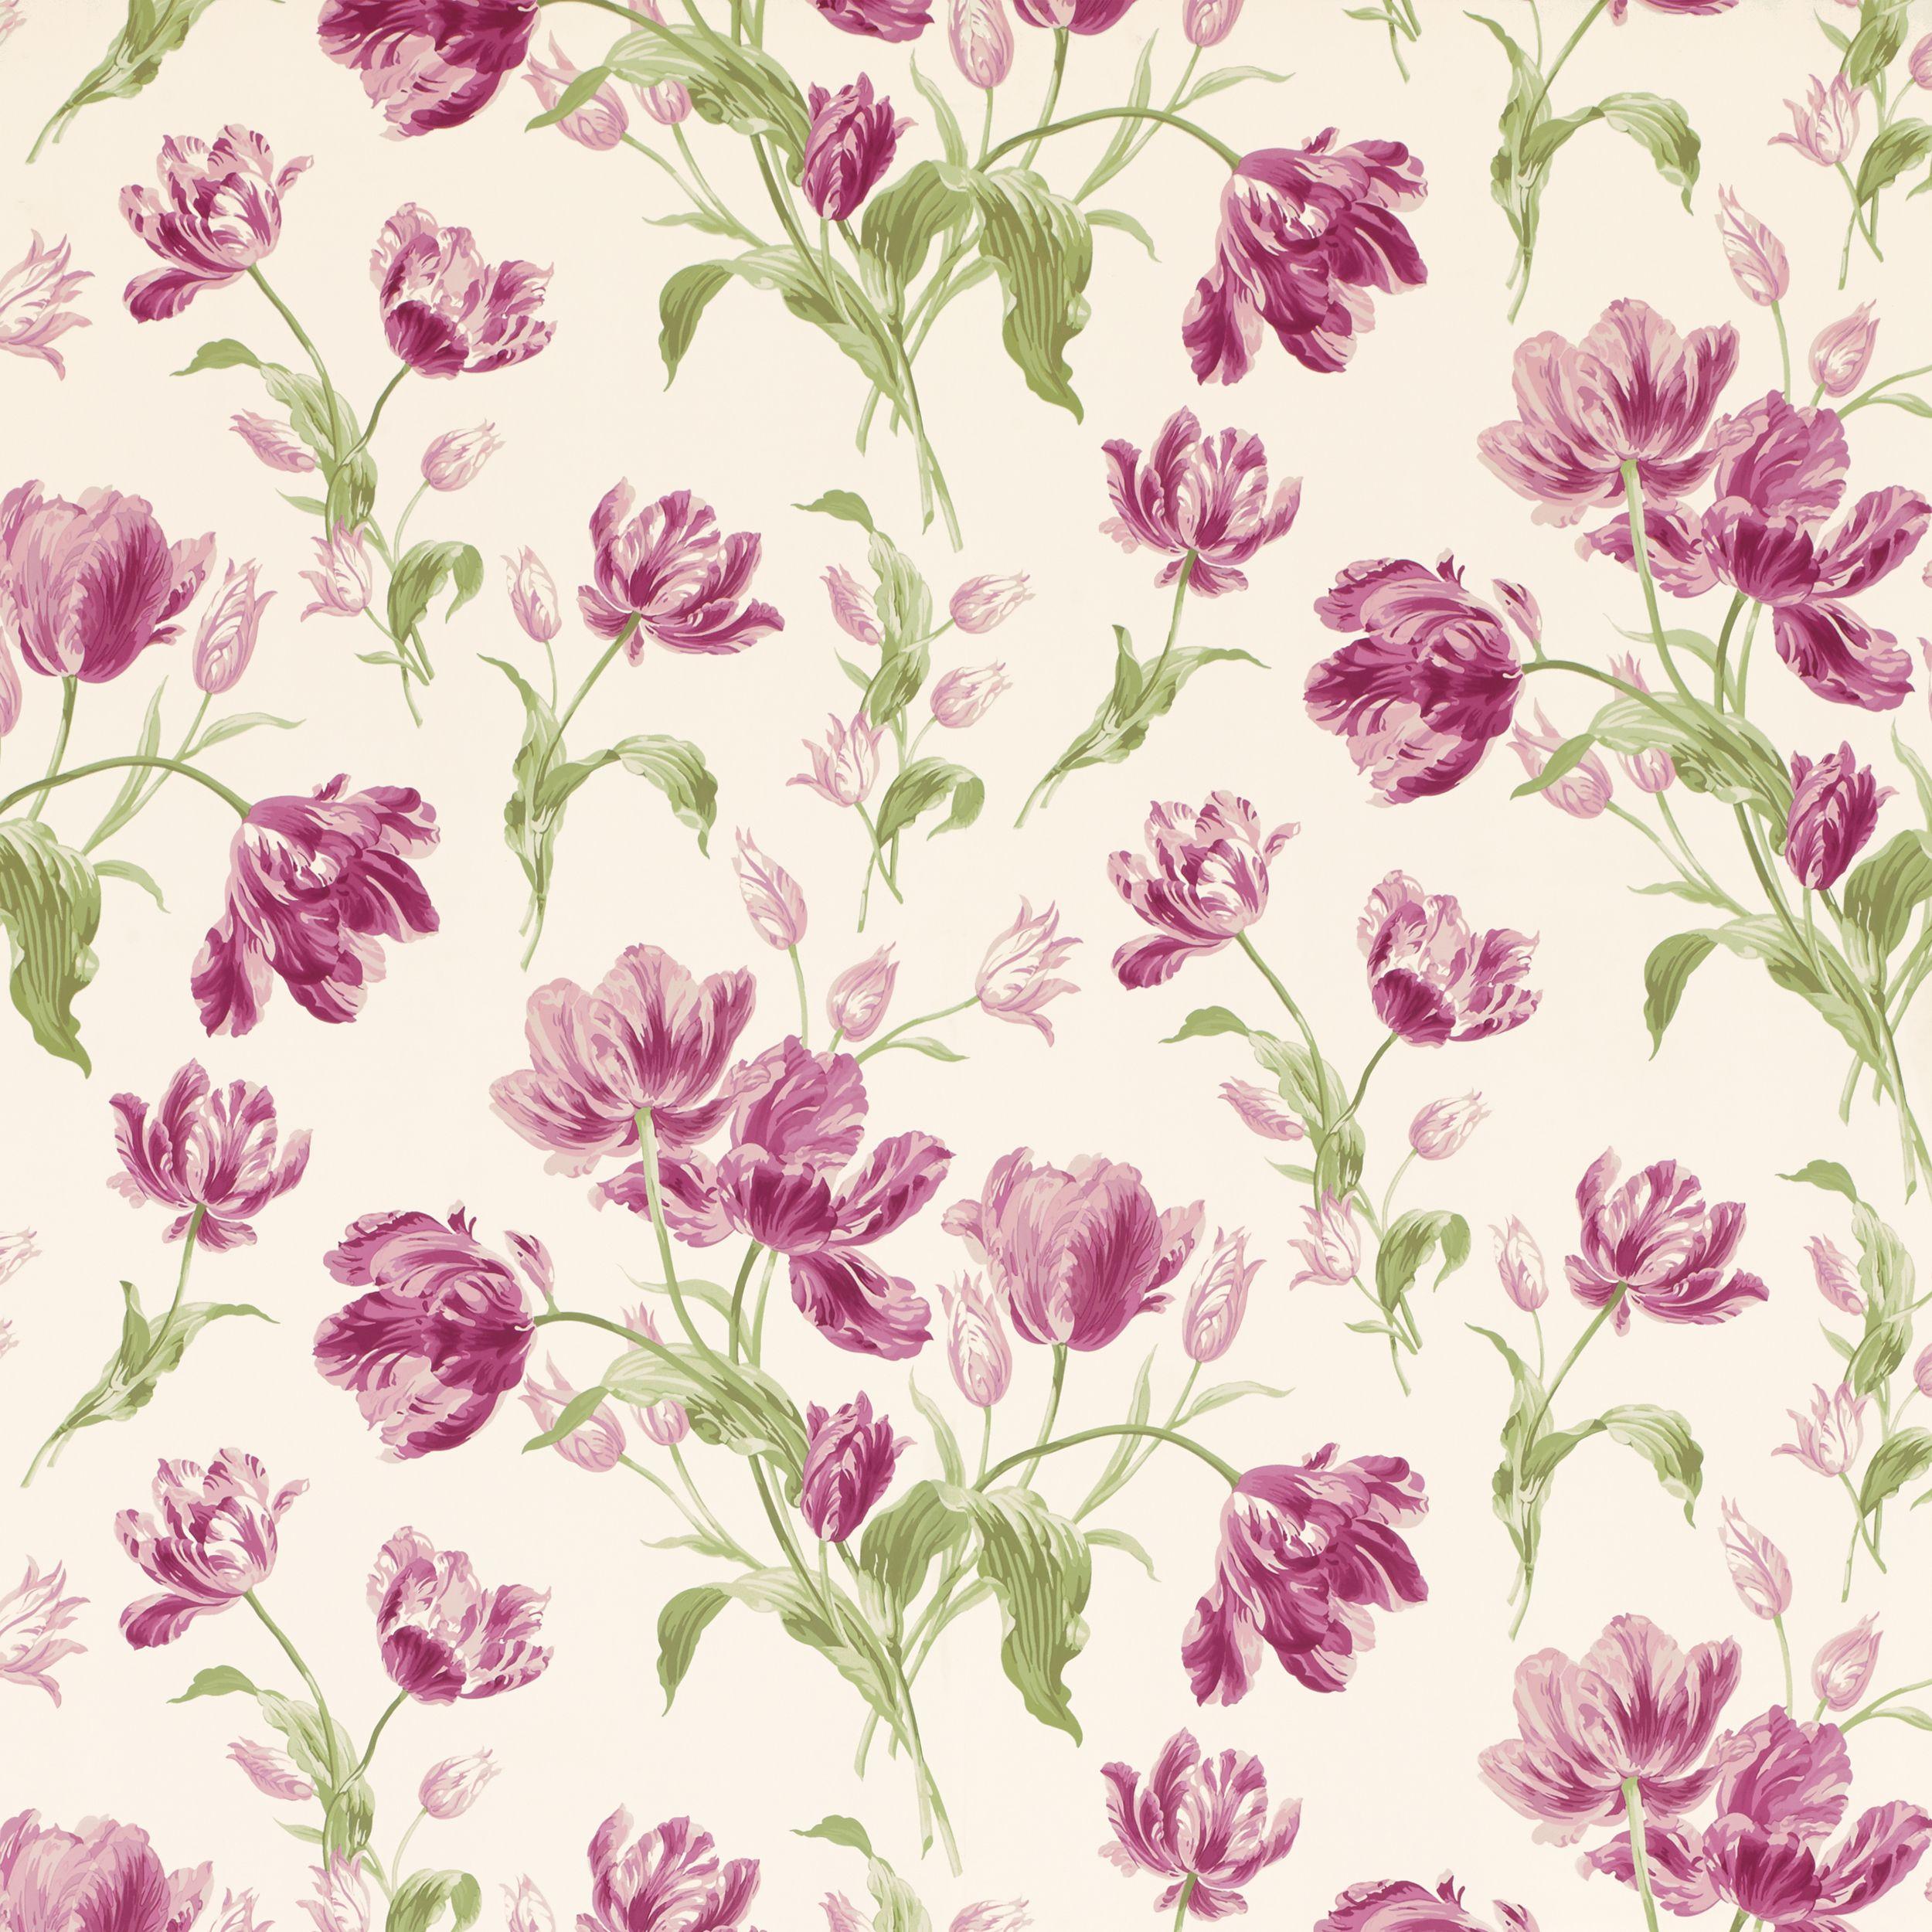 Laura Ashley Kitchen Wallpaper: Gosford Meadow Berry Wallpaper At Laura Ashley